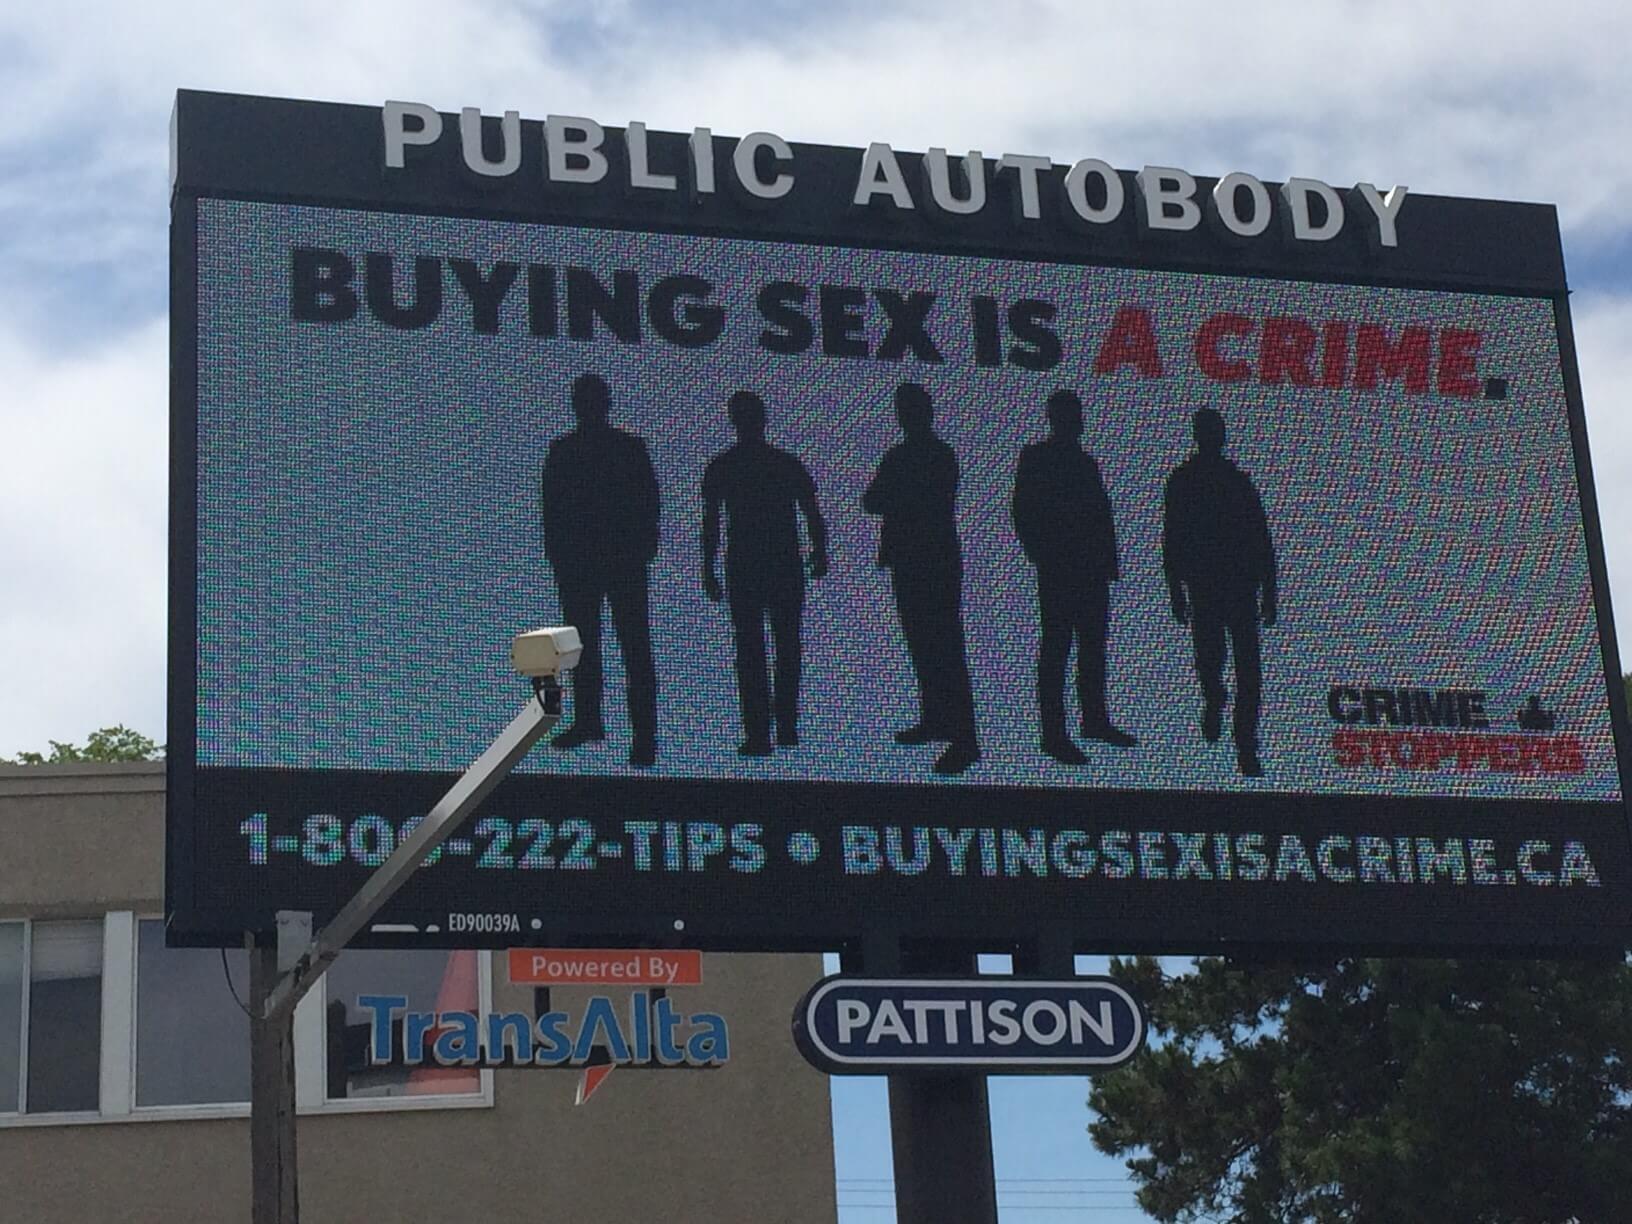 billboard-example.jpg